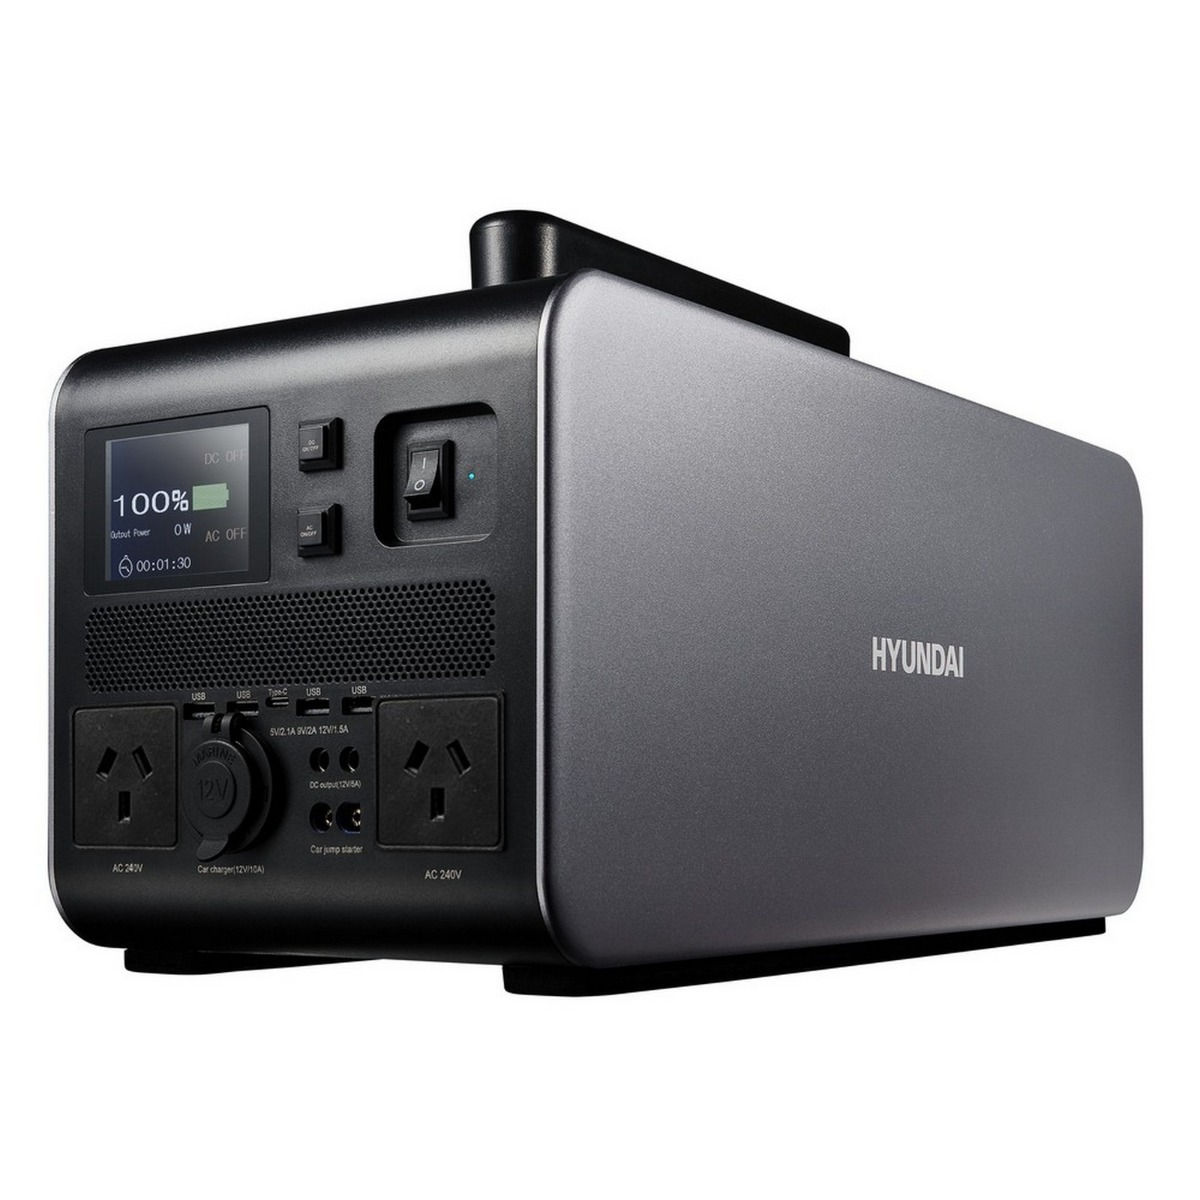 Hyundai 1000W / 2000W max LiFePO4 Lithium Power Station AC/DC - 1075Wh Battery